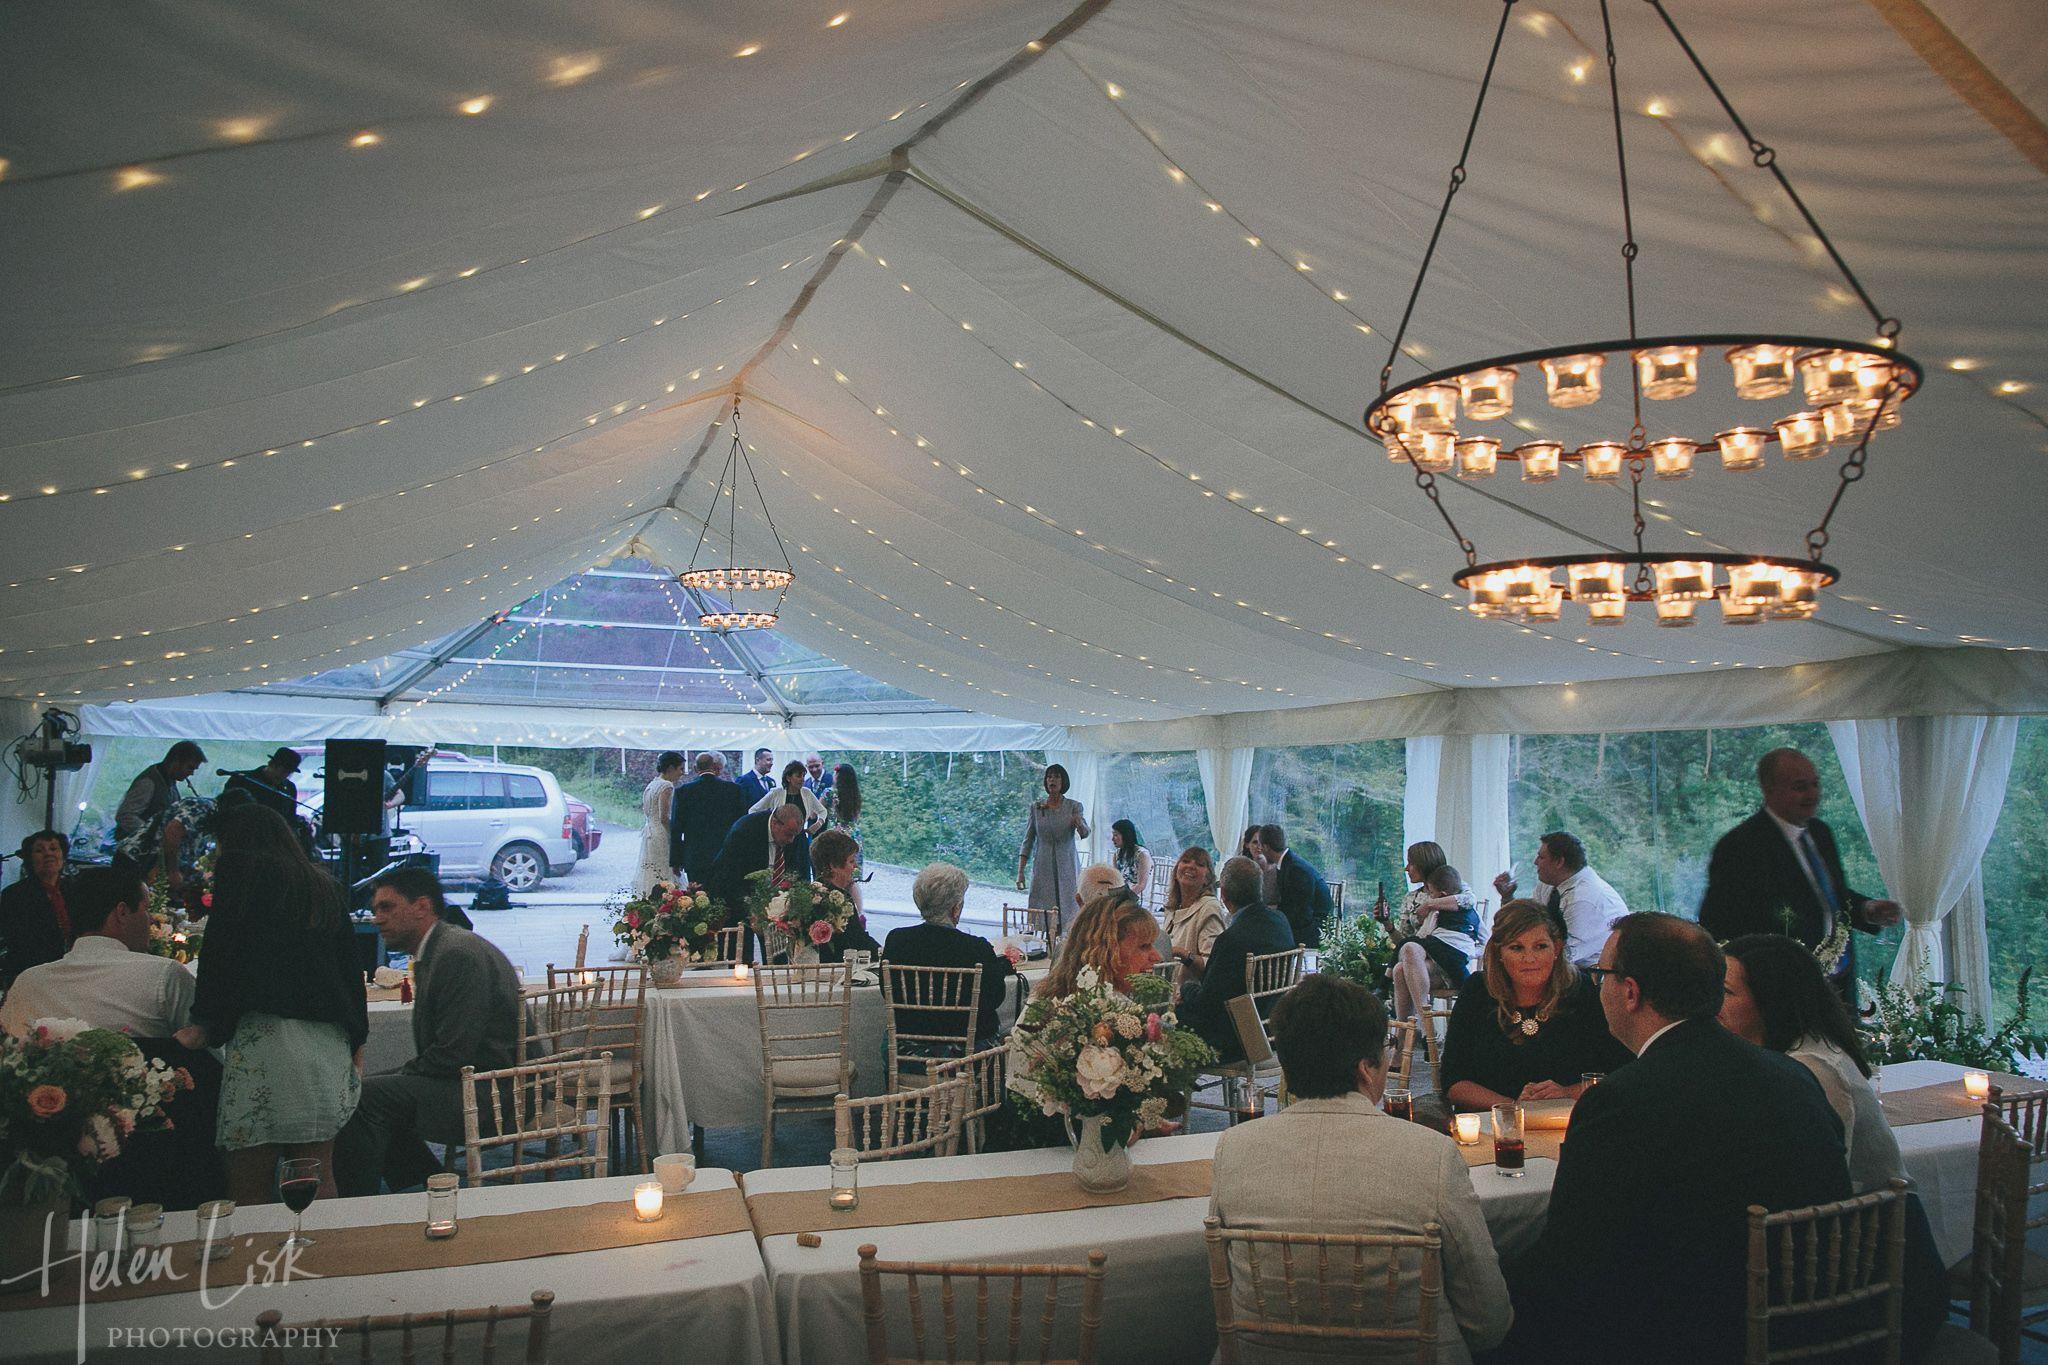 Wedding marquee with festoonfairy lights behind flat roof linings wedding marquee with festoonfairy lights behind flat roof linings and hanging tea light chandeliers arubaitofo Gallery